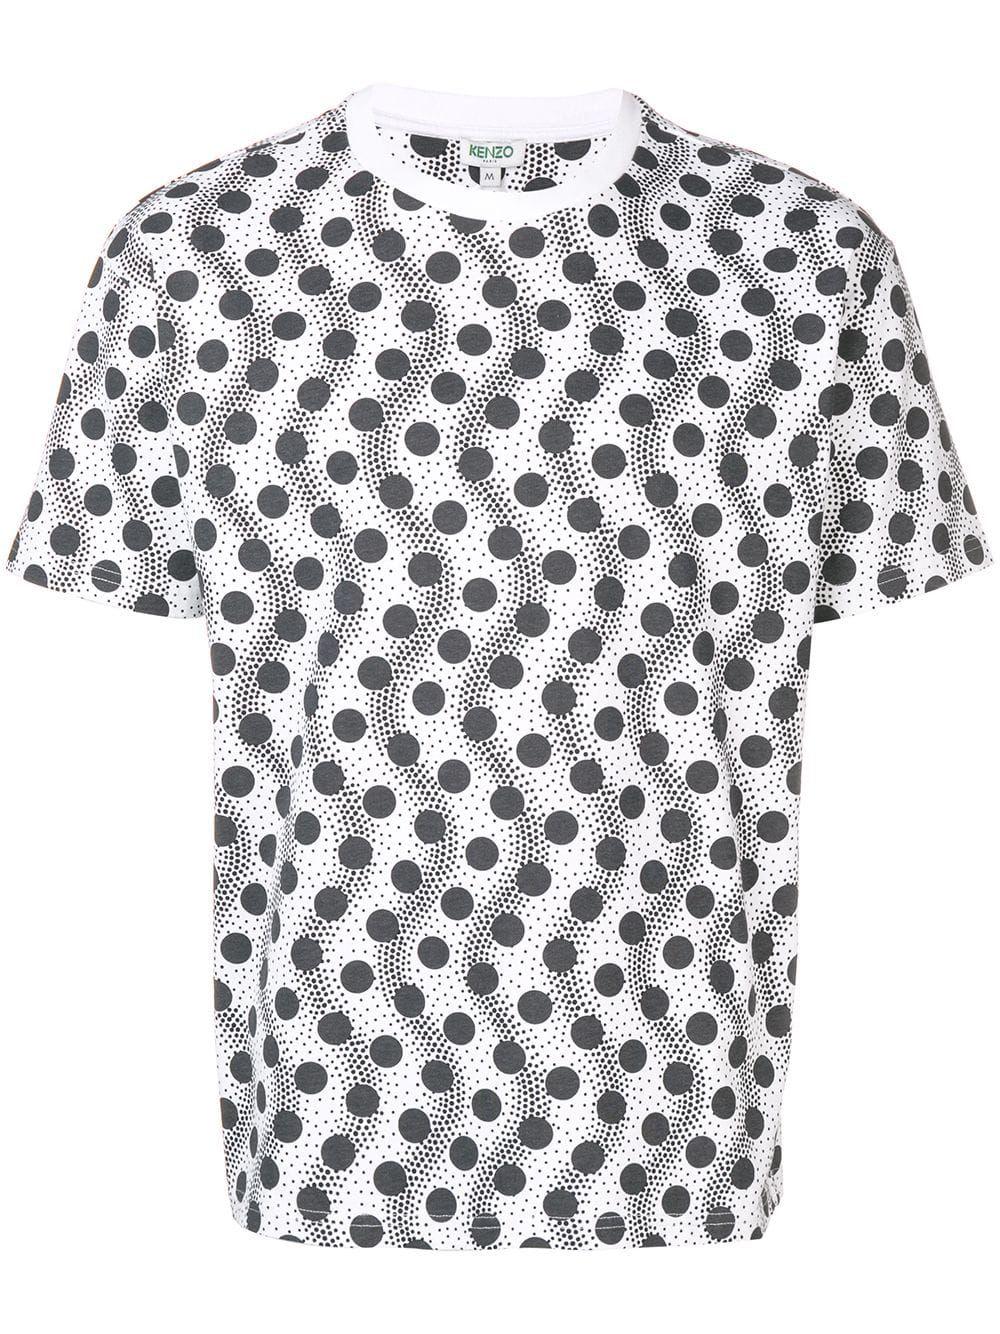 03987284 Kenzo polka dot logo T-shirt - White | Products in 2019 | Dot logo ...